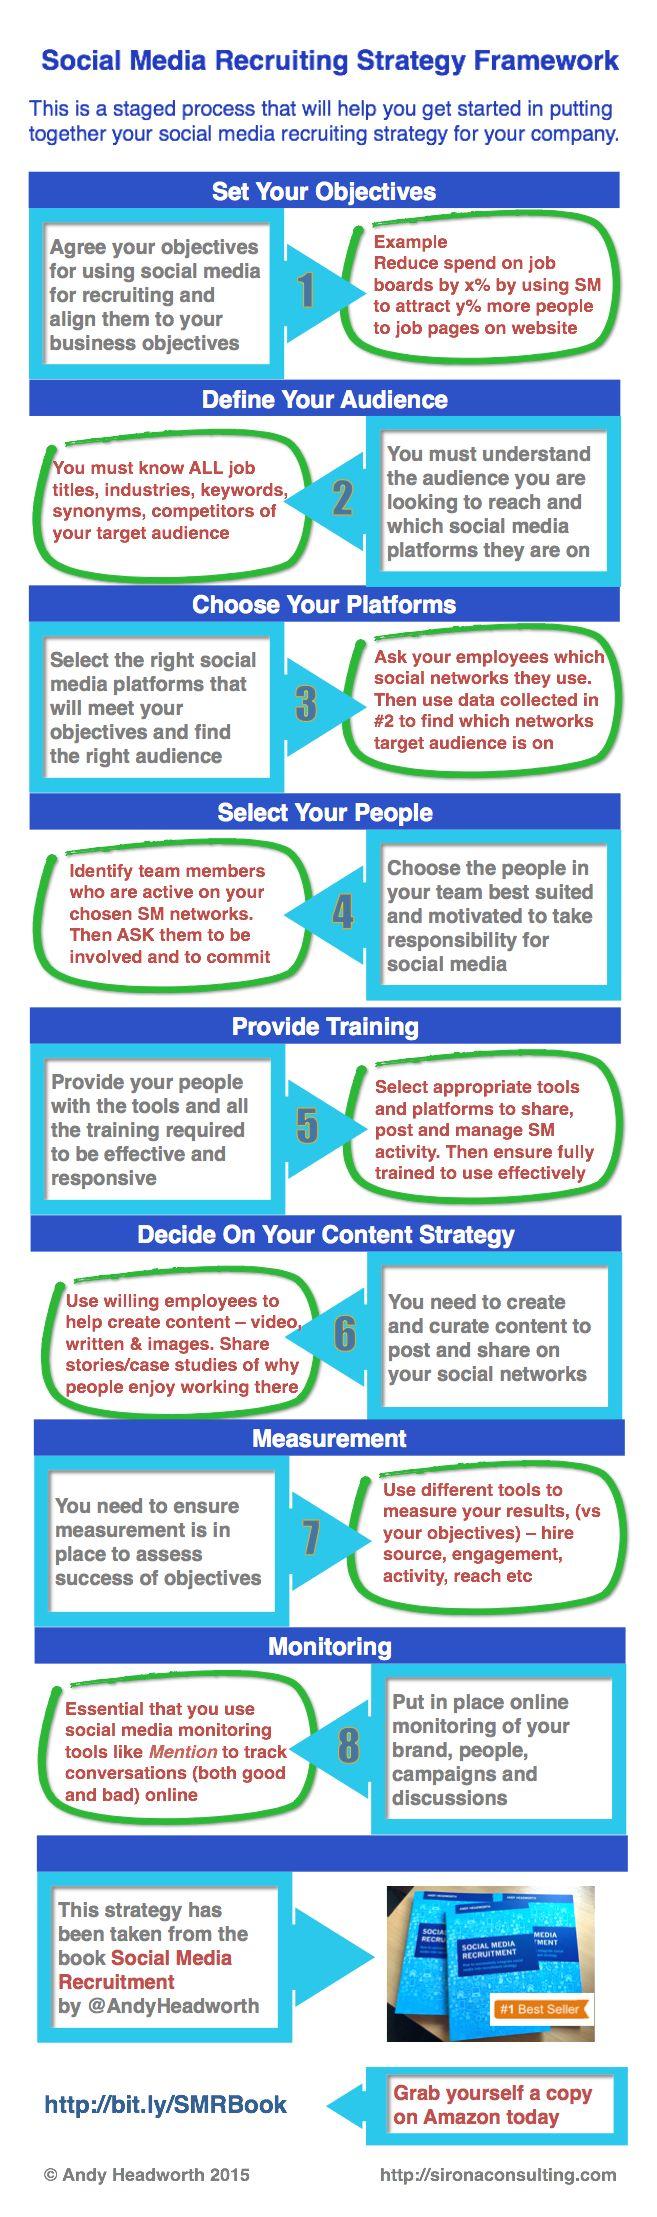 social media recruitment strategy framework infographic